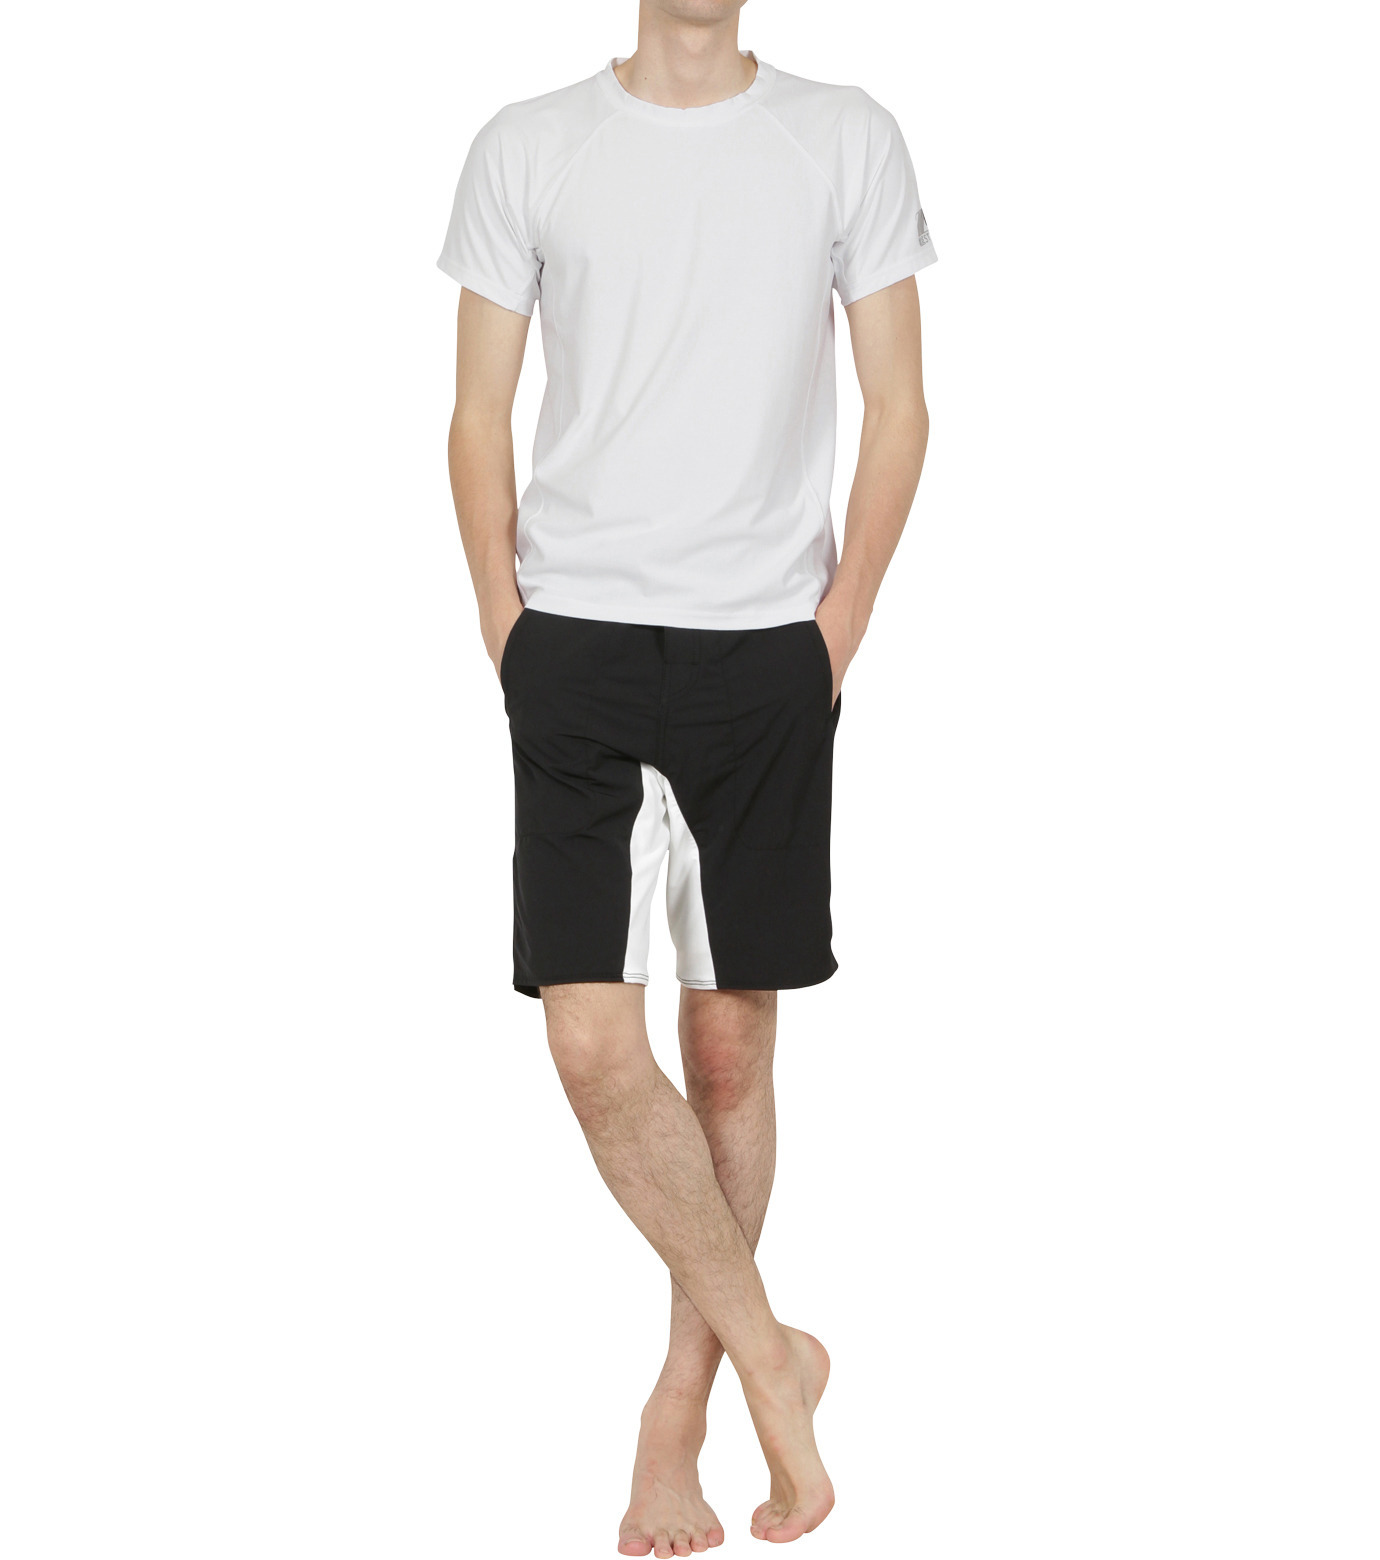 TWO TWO ONE(トゥートゥーワン)のSurf shorts long-WHITE(SWIMWEAR/SWIMWEAR)-15N948002-4 拡大詳細画像3